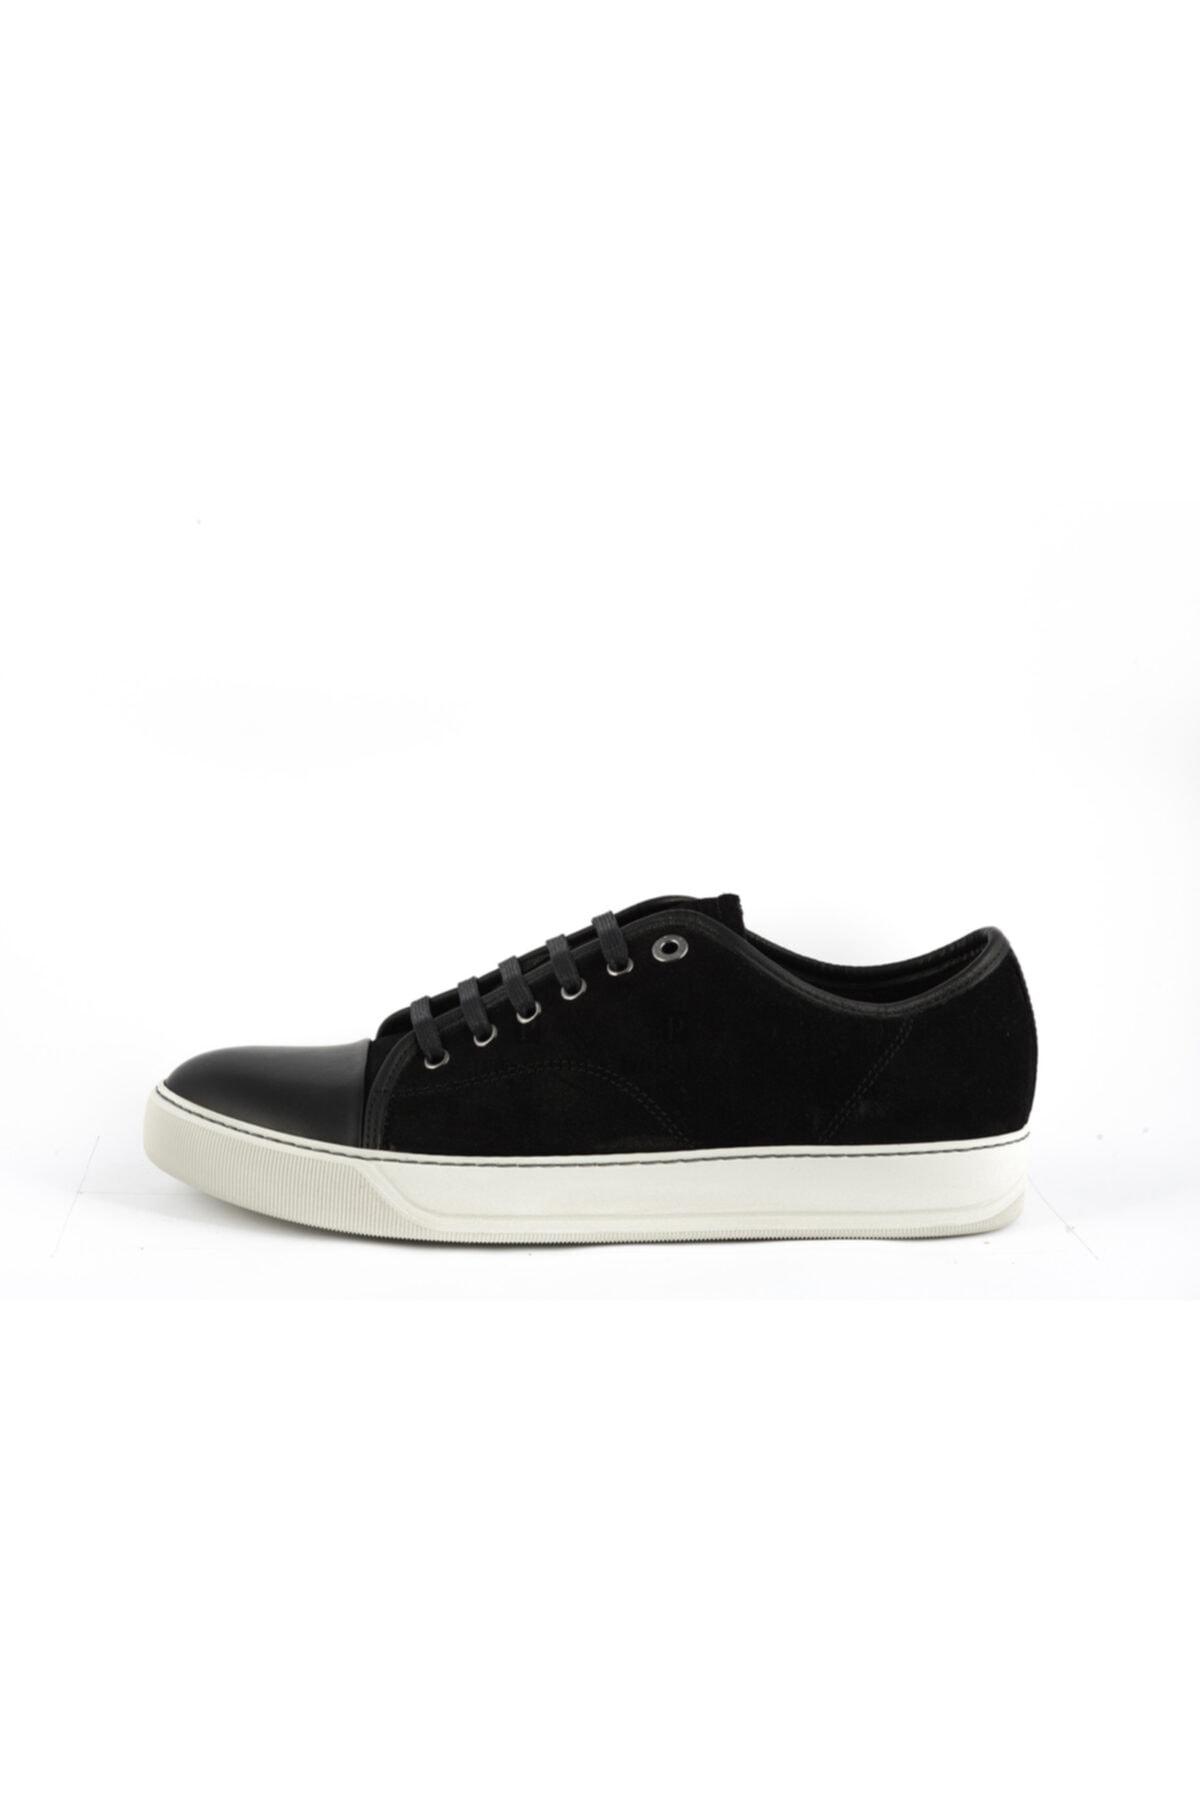 Lanvin Sneakers 1